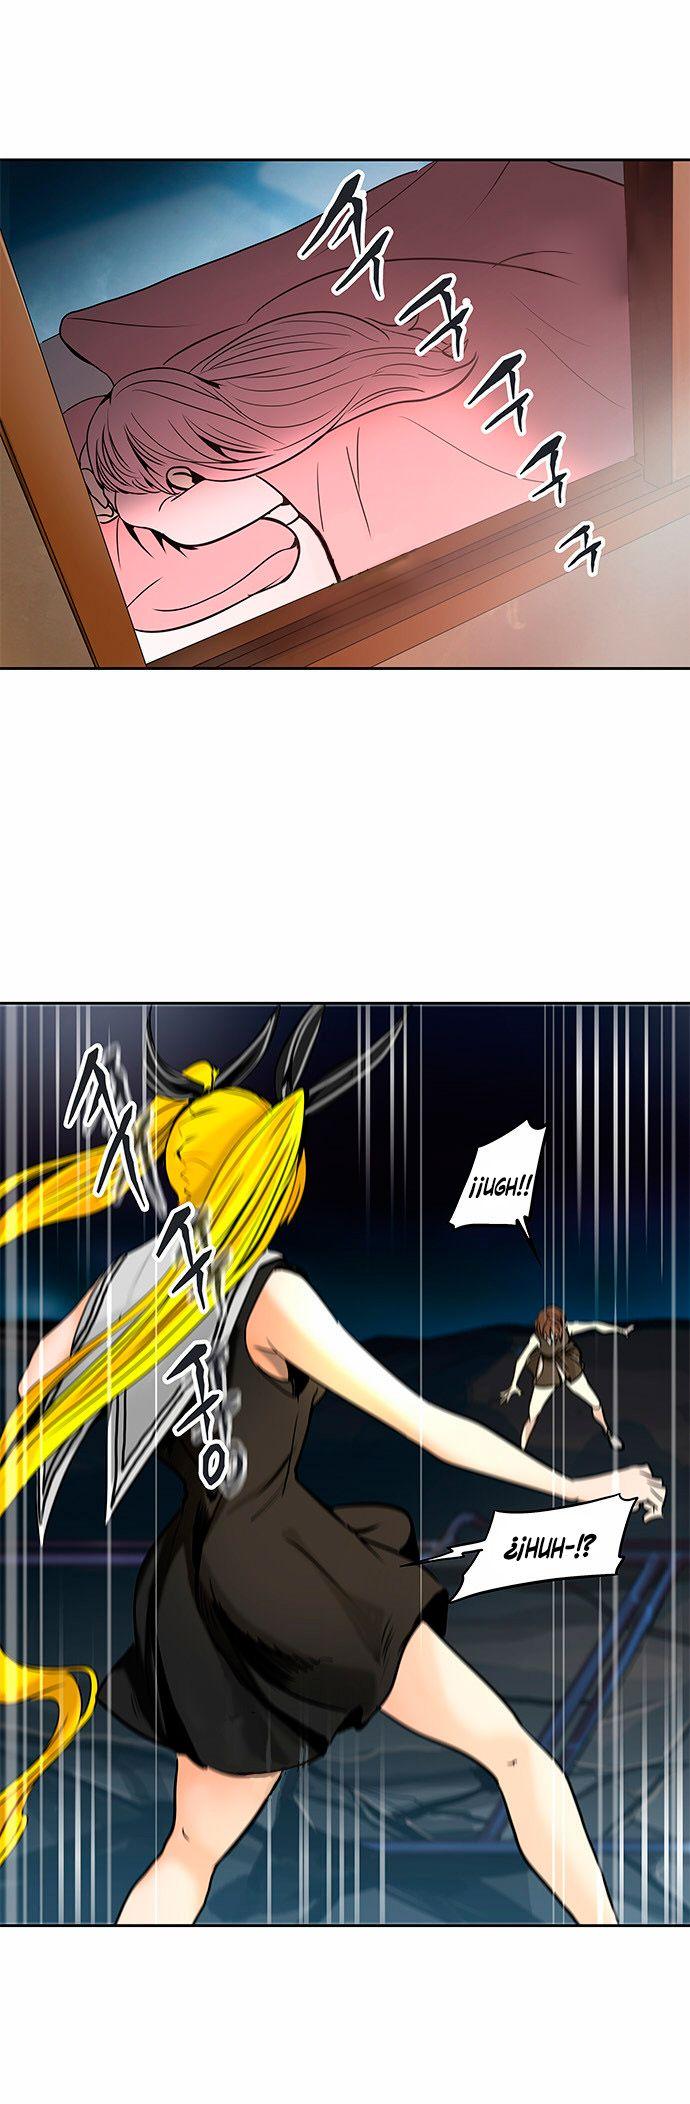 http://c5.ninemanga.com/es_manga/pic2/21/149/512547/5a6784110c57bc99ce3532e4209a81e6.jpg Page 4